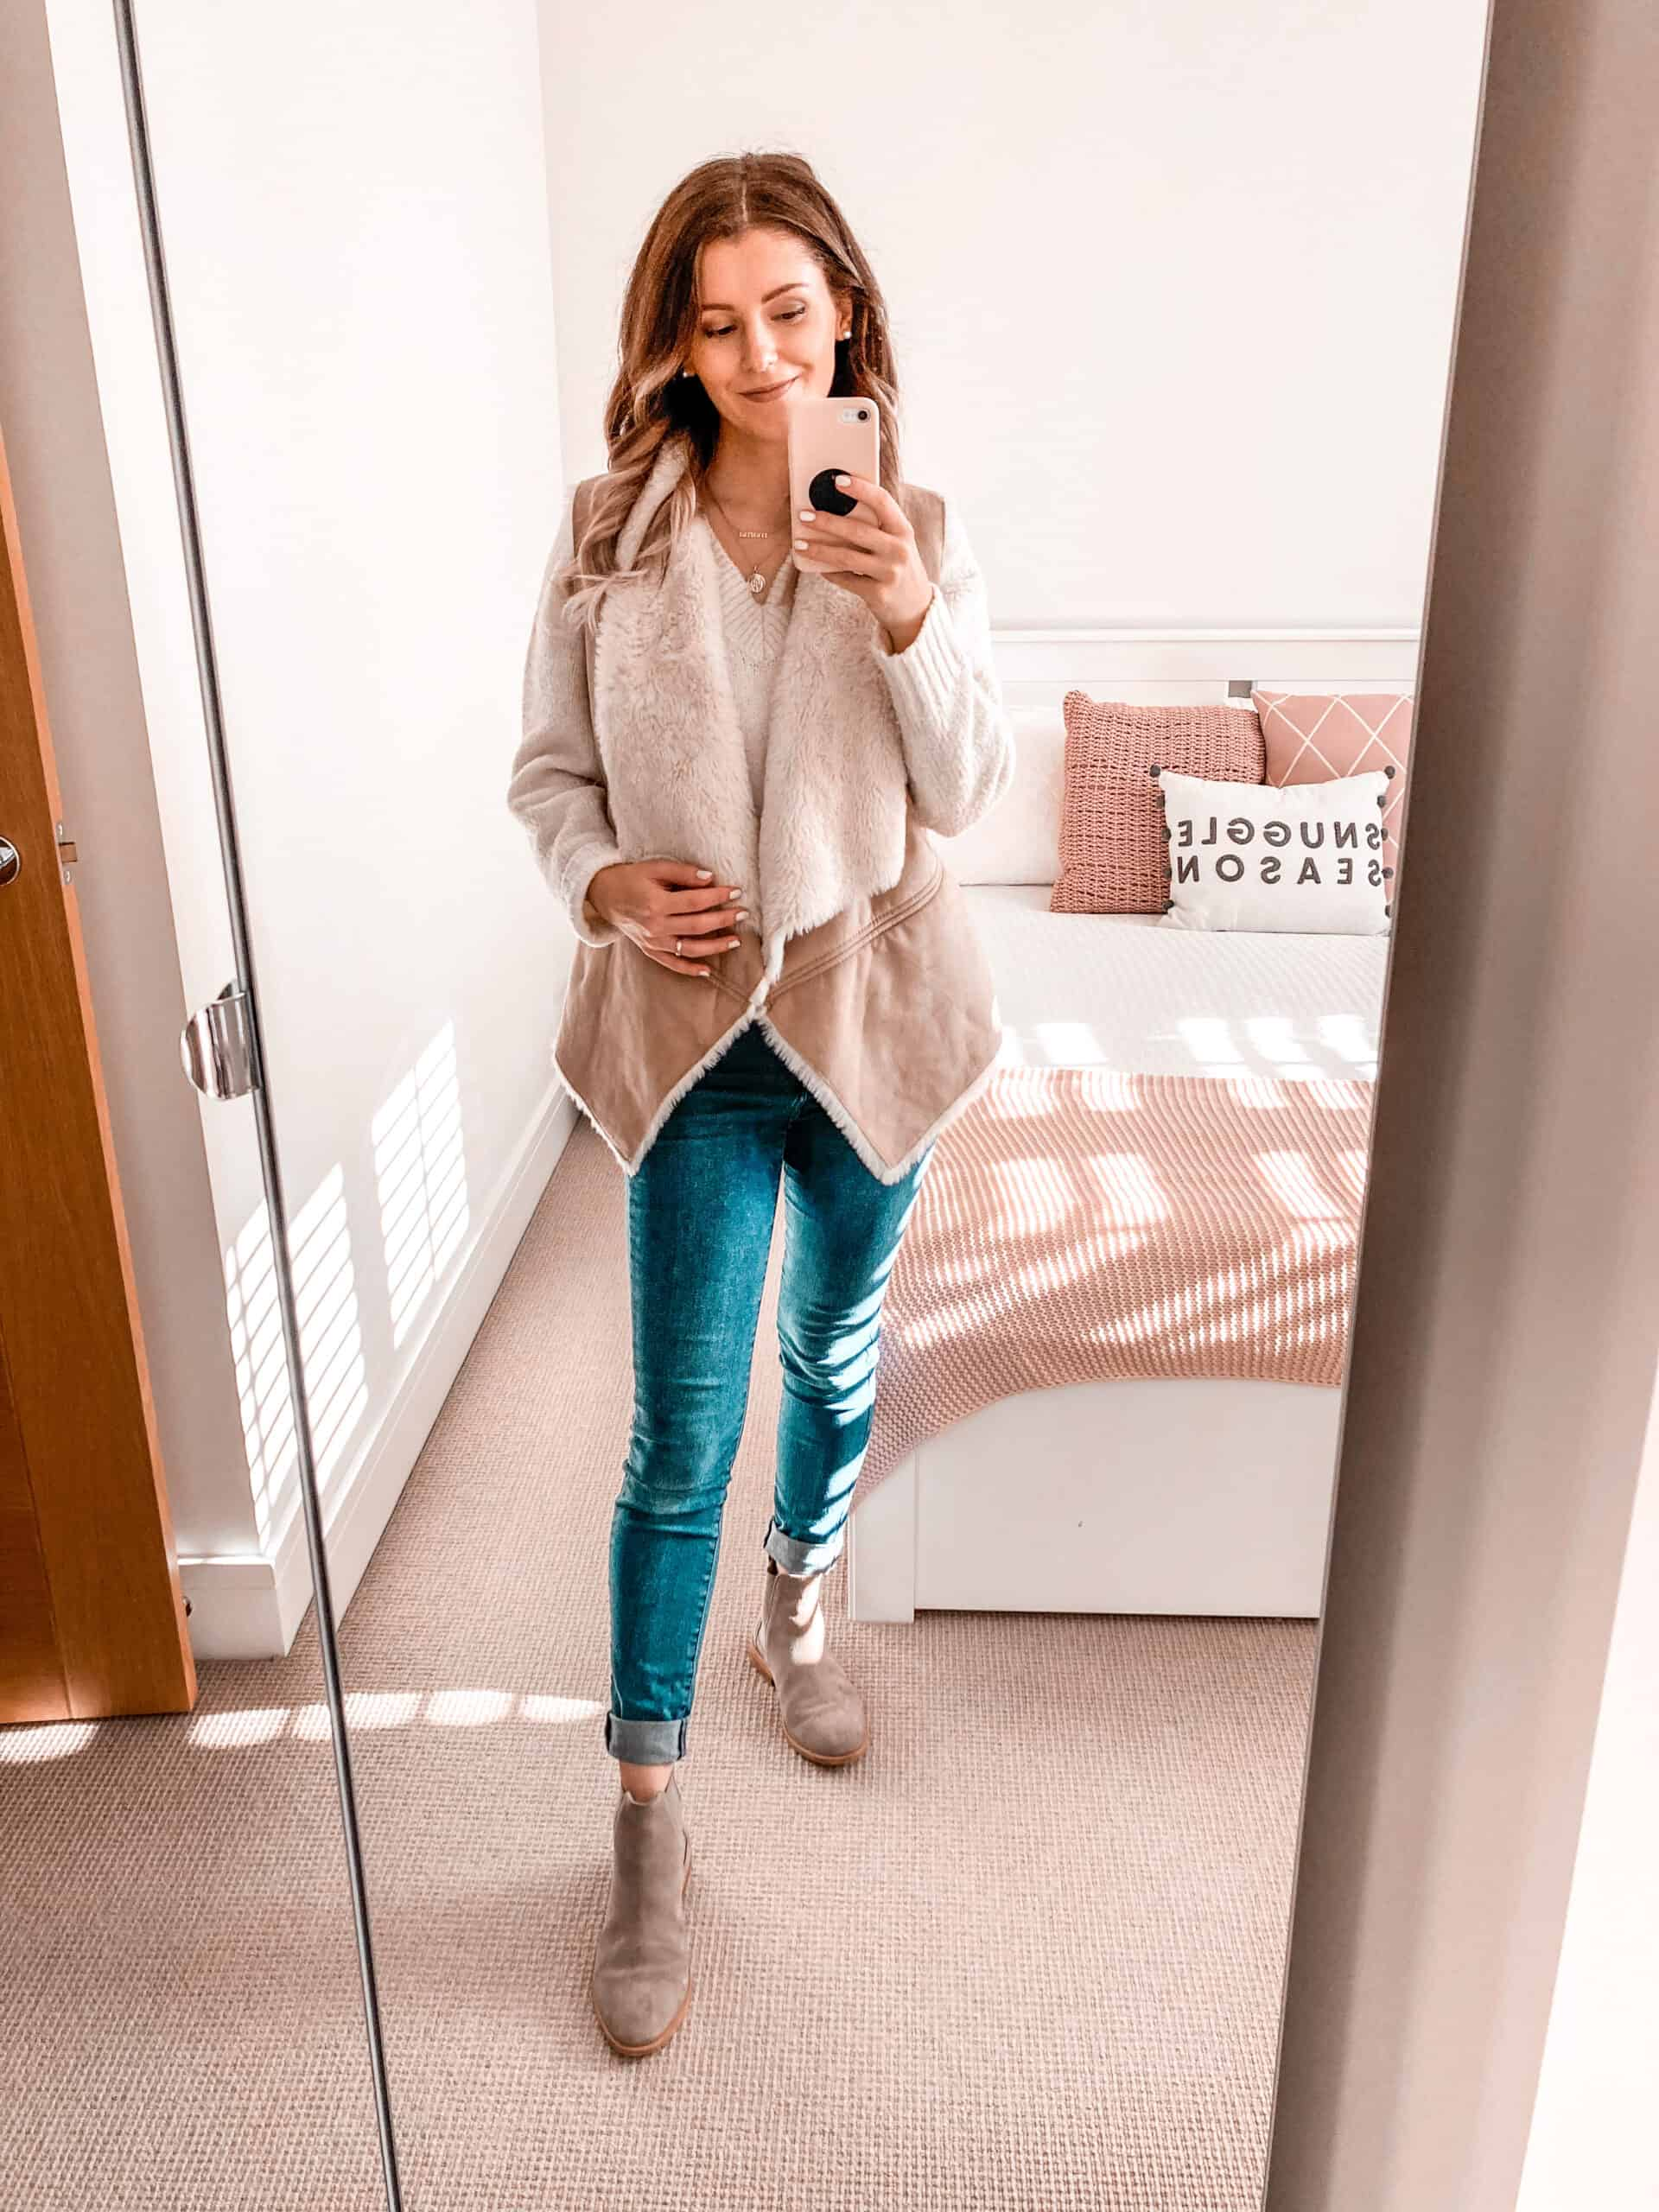 Faux fur vest gilet oversized knitwear tan chelsea boots fall outfit